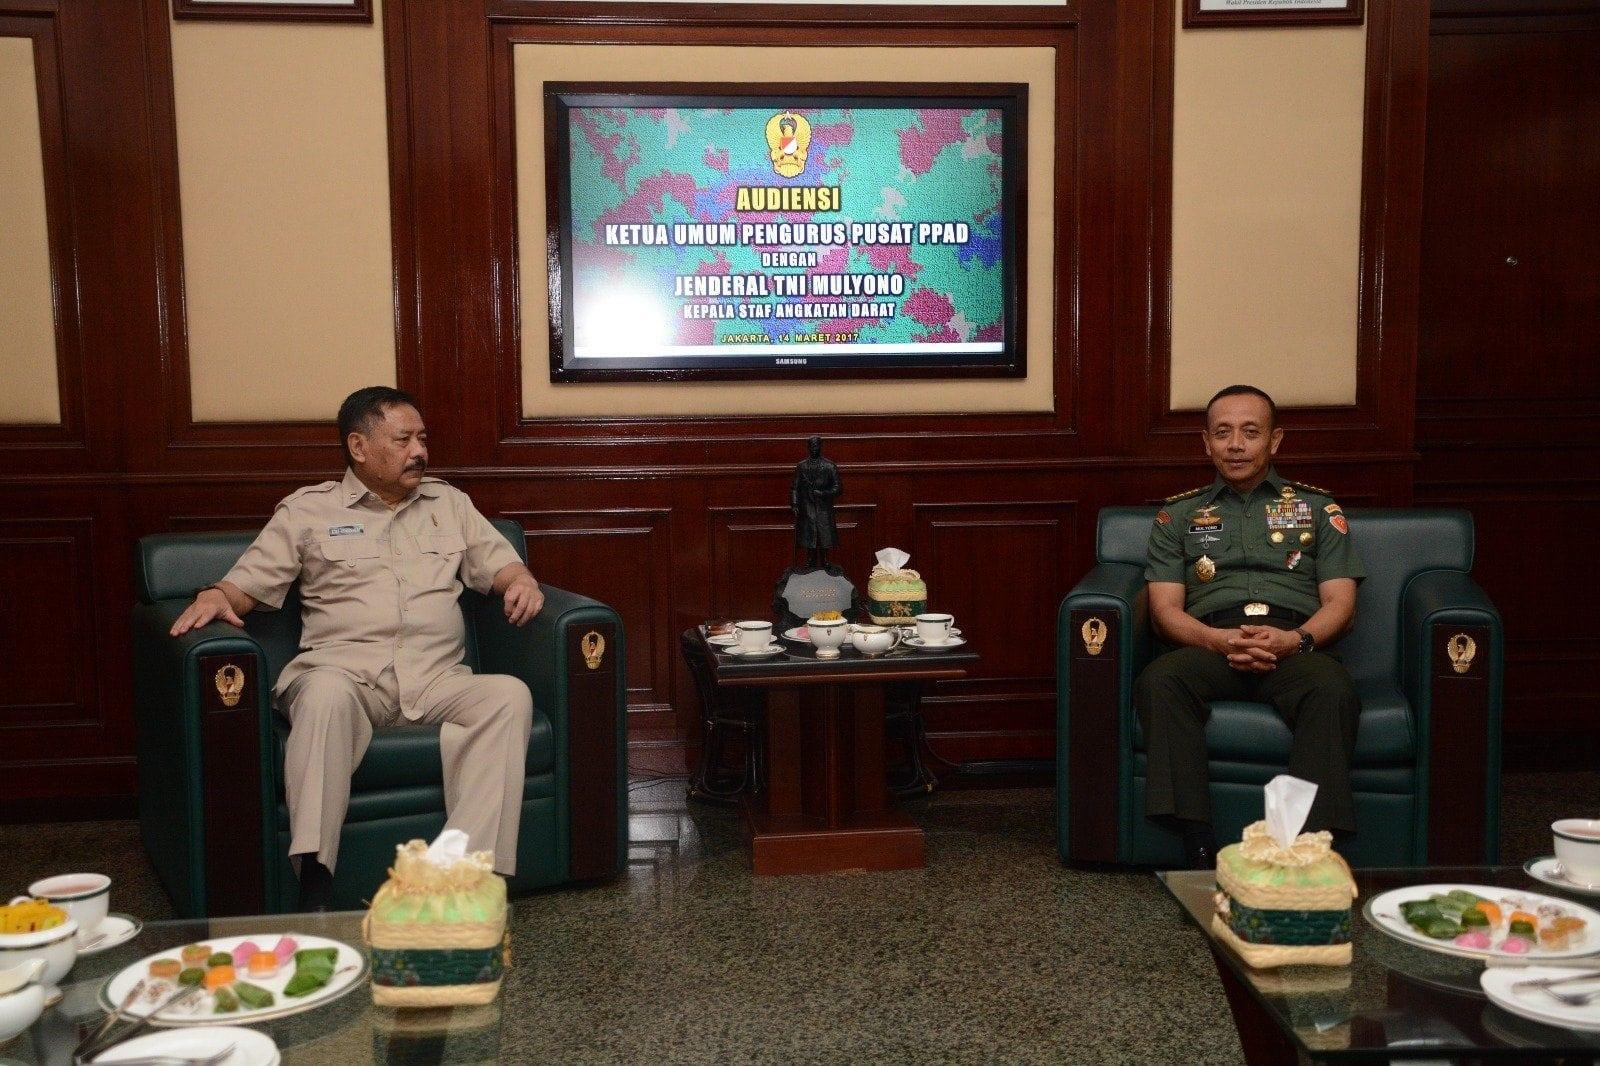 PPAD Komitmen Dukung Kebijakan TNI AD